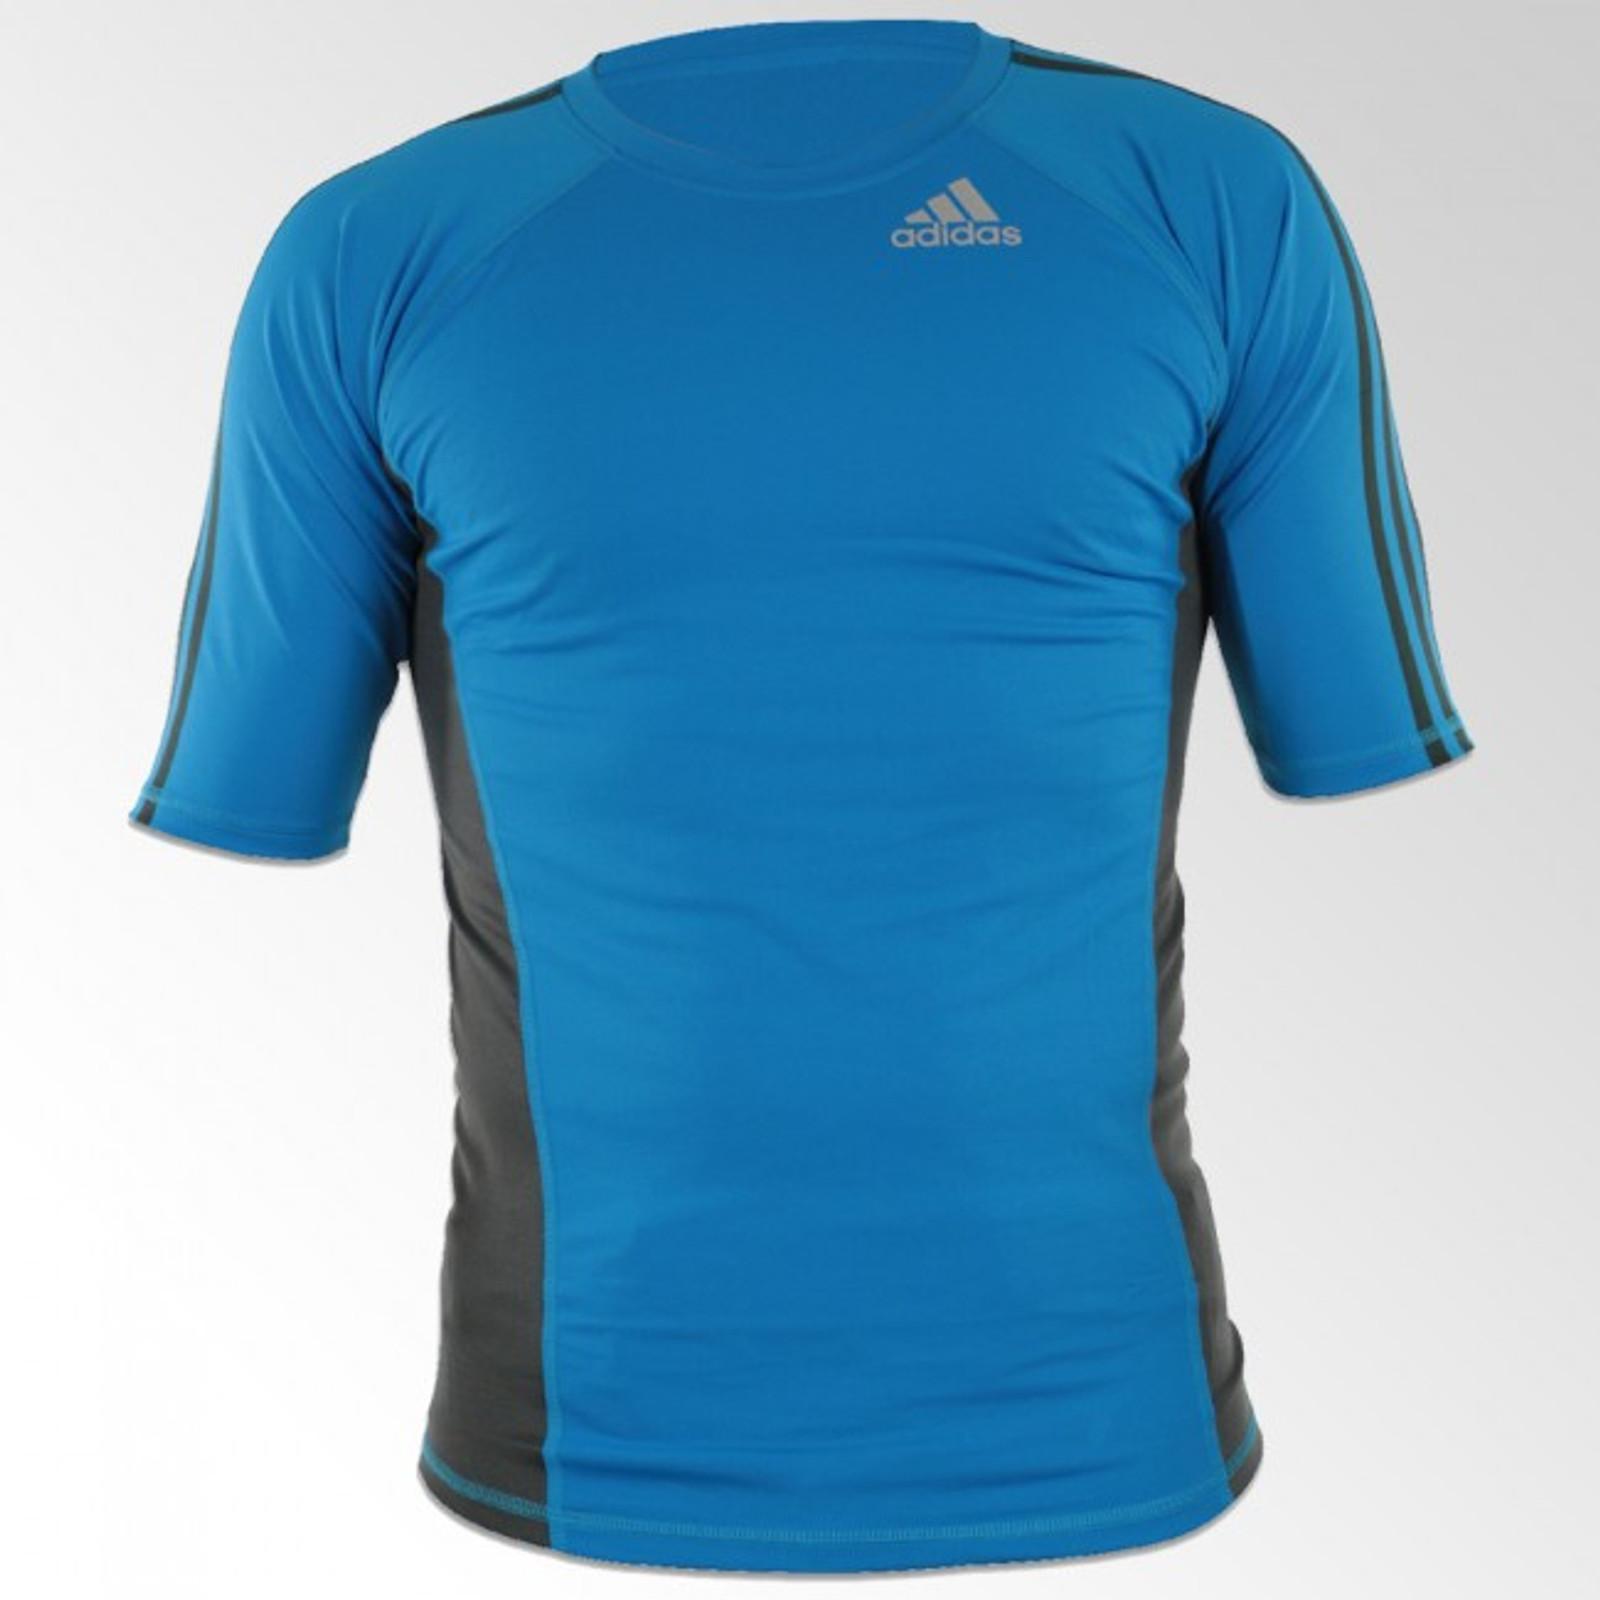 adidas Herren Kurzarm Rashguard Transition in Blau-Grau